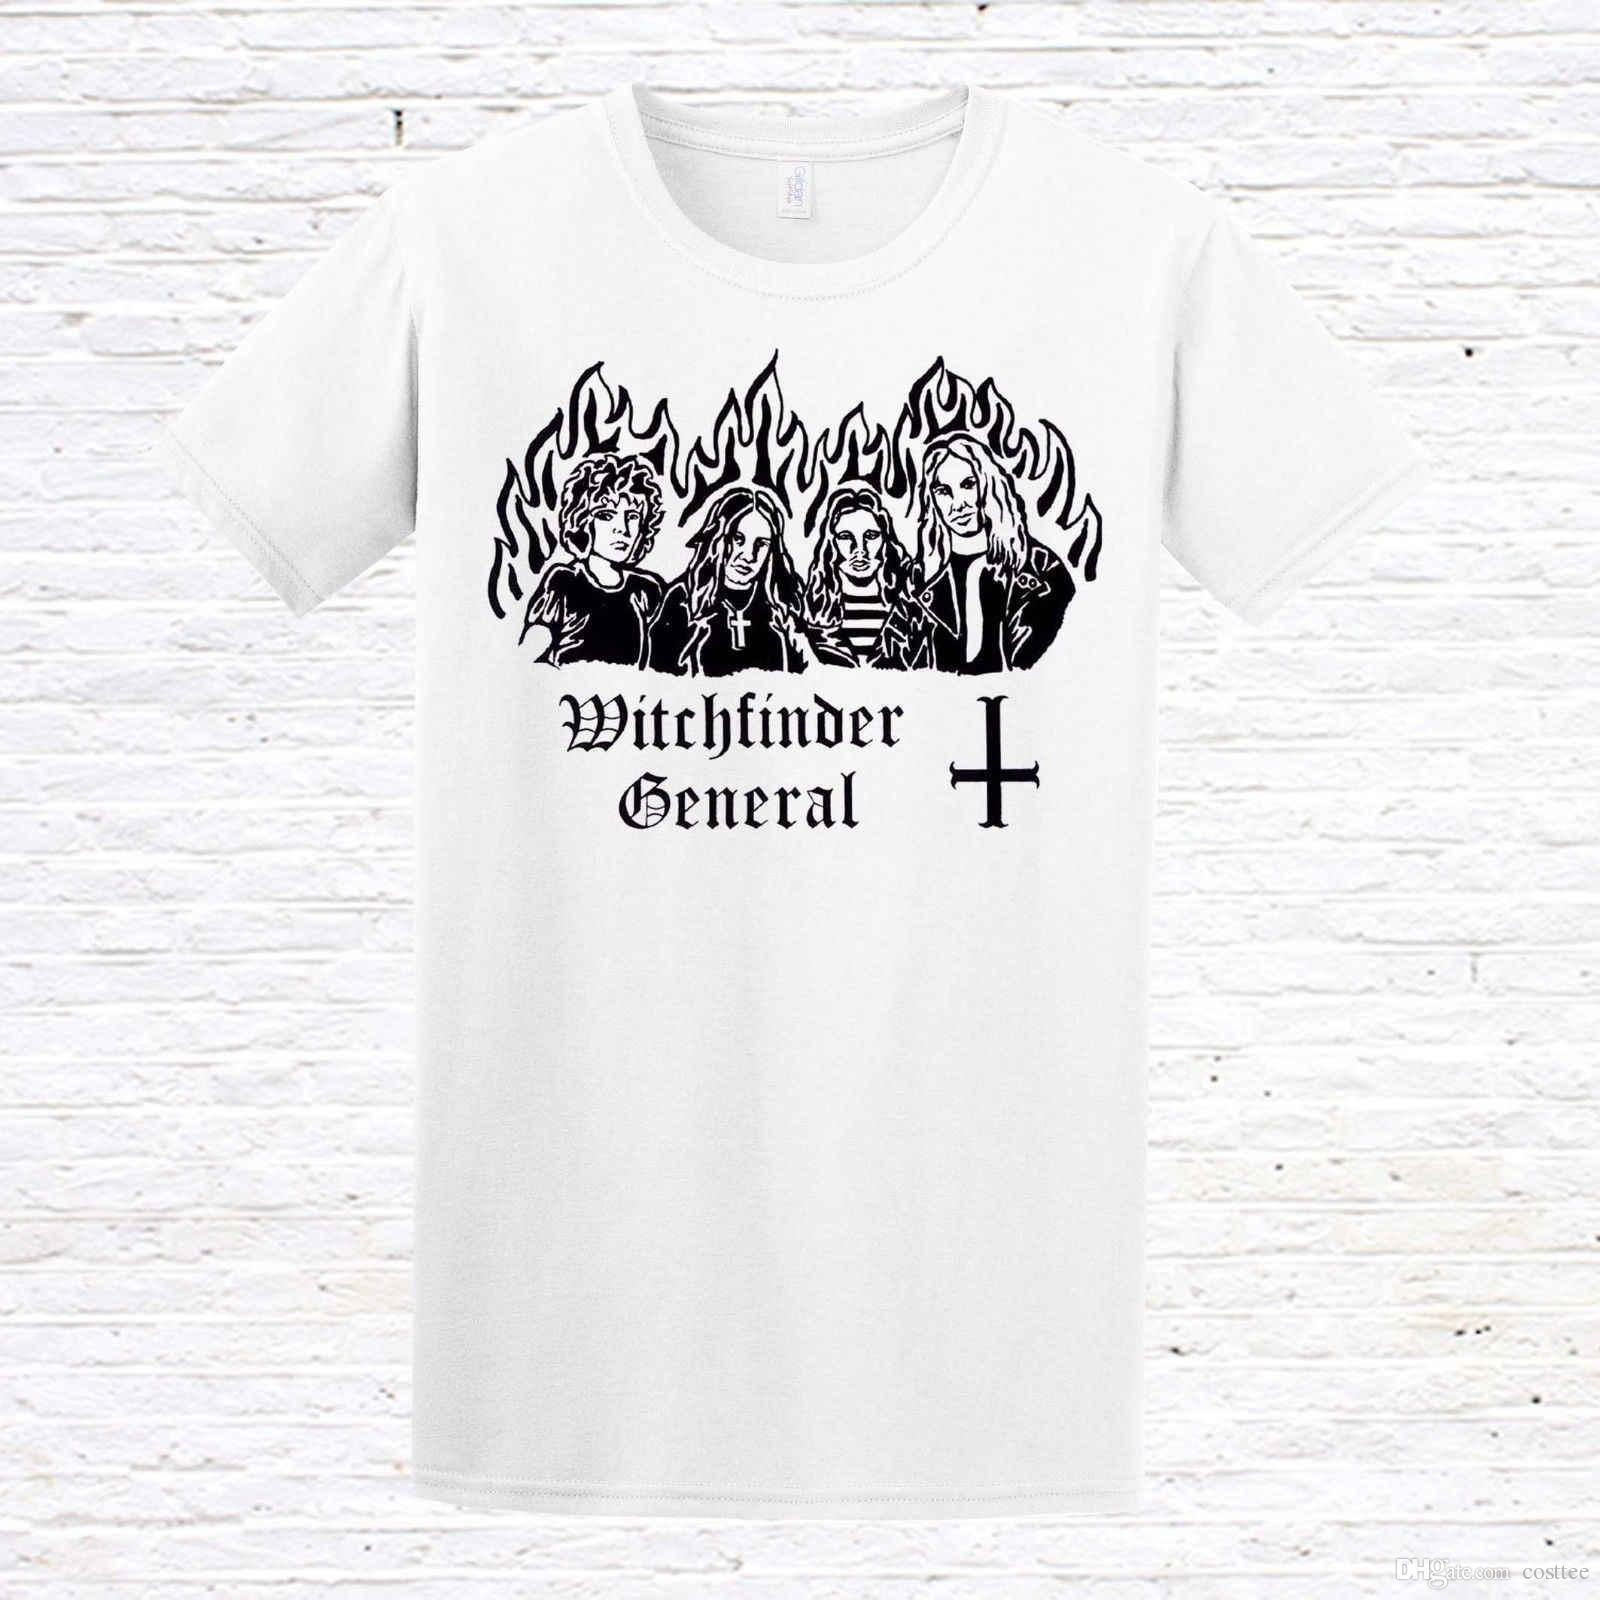 Witchfinder Shirts And Nwobhmdoommetal General Shirt T OTPZkXui